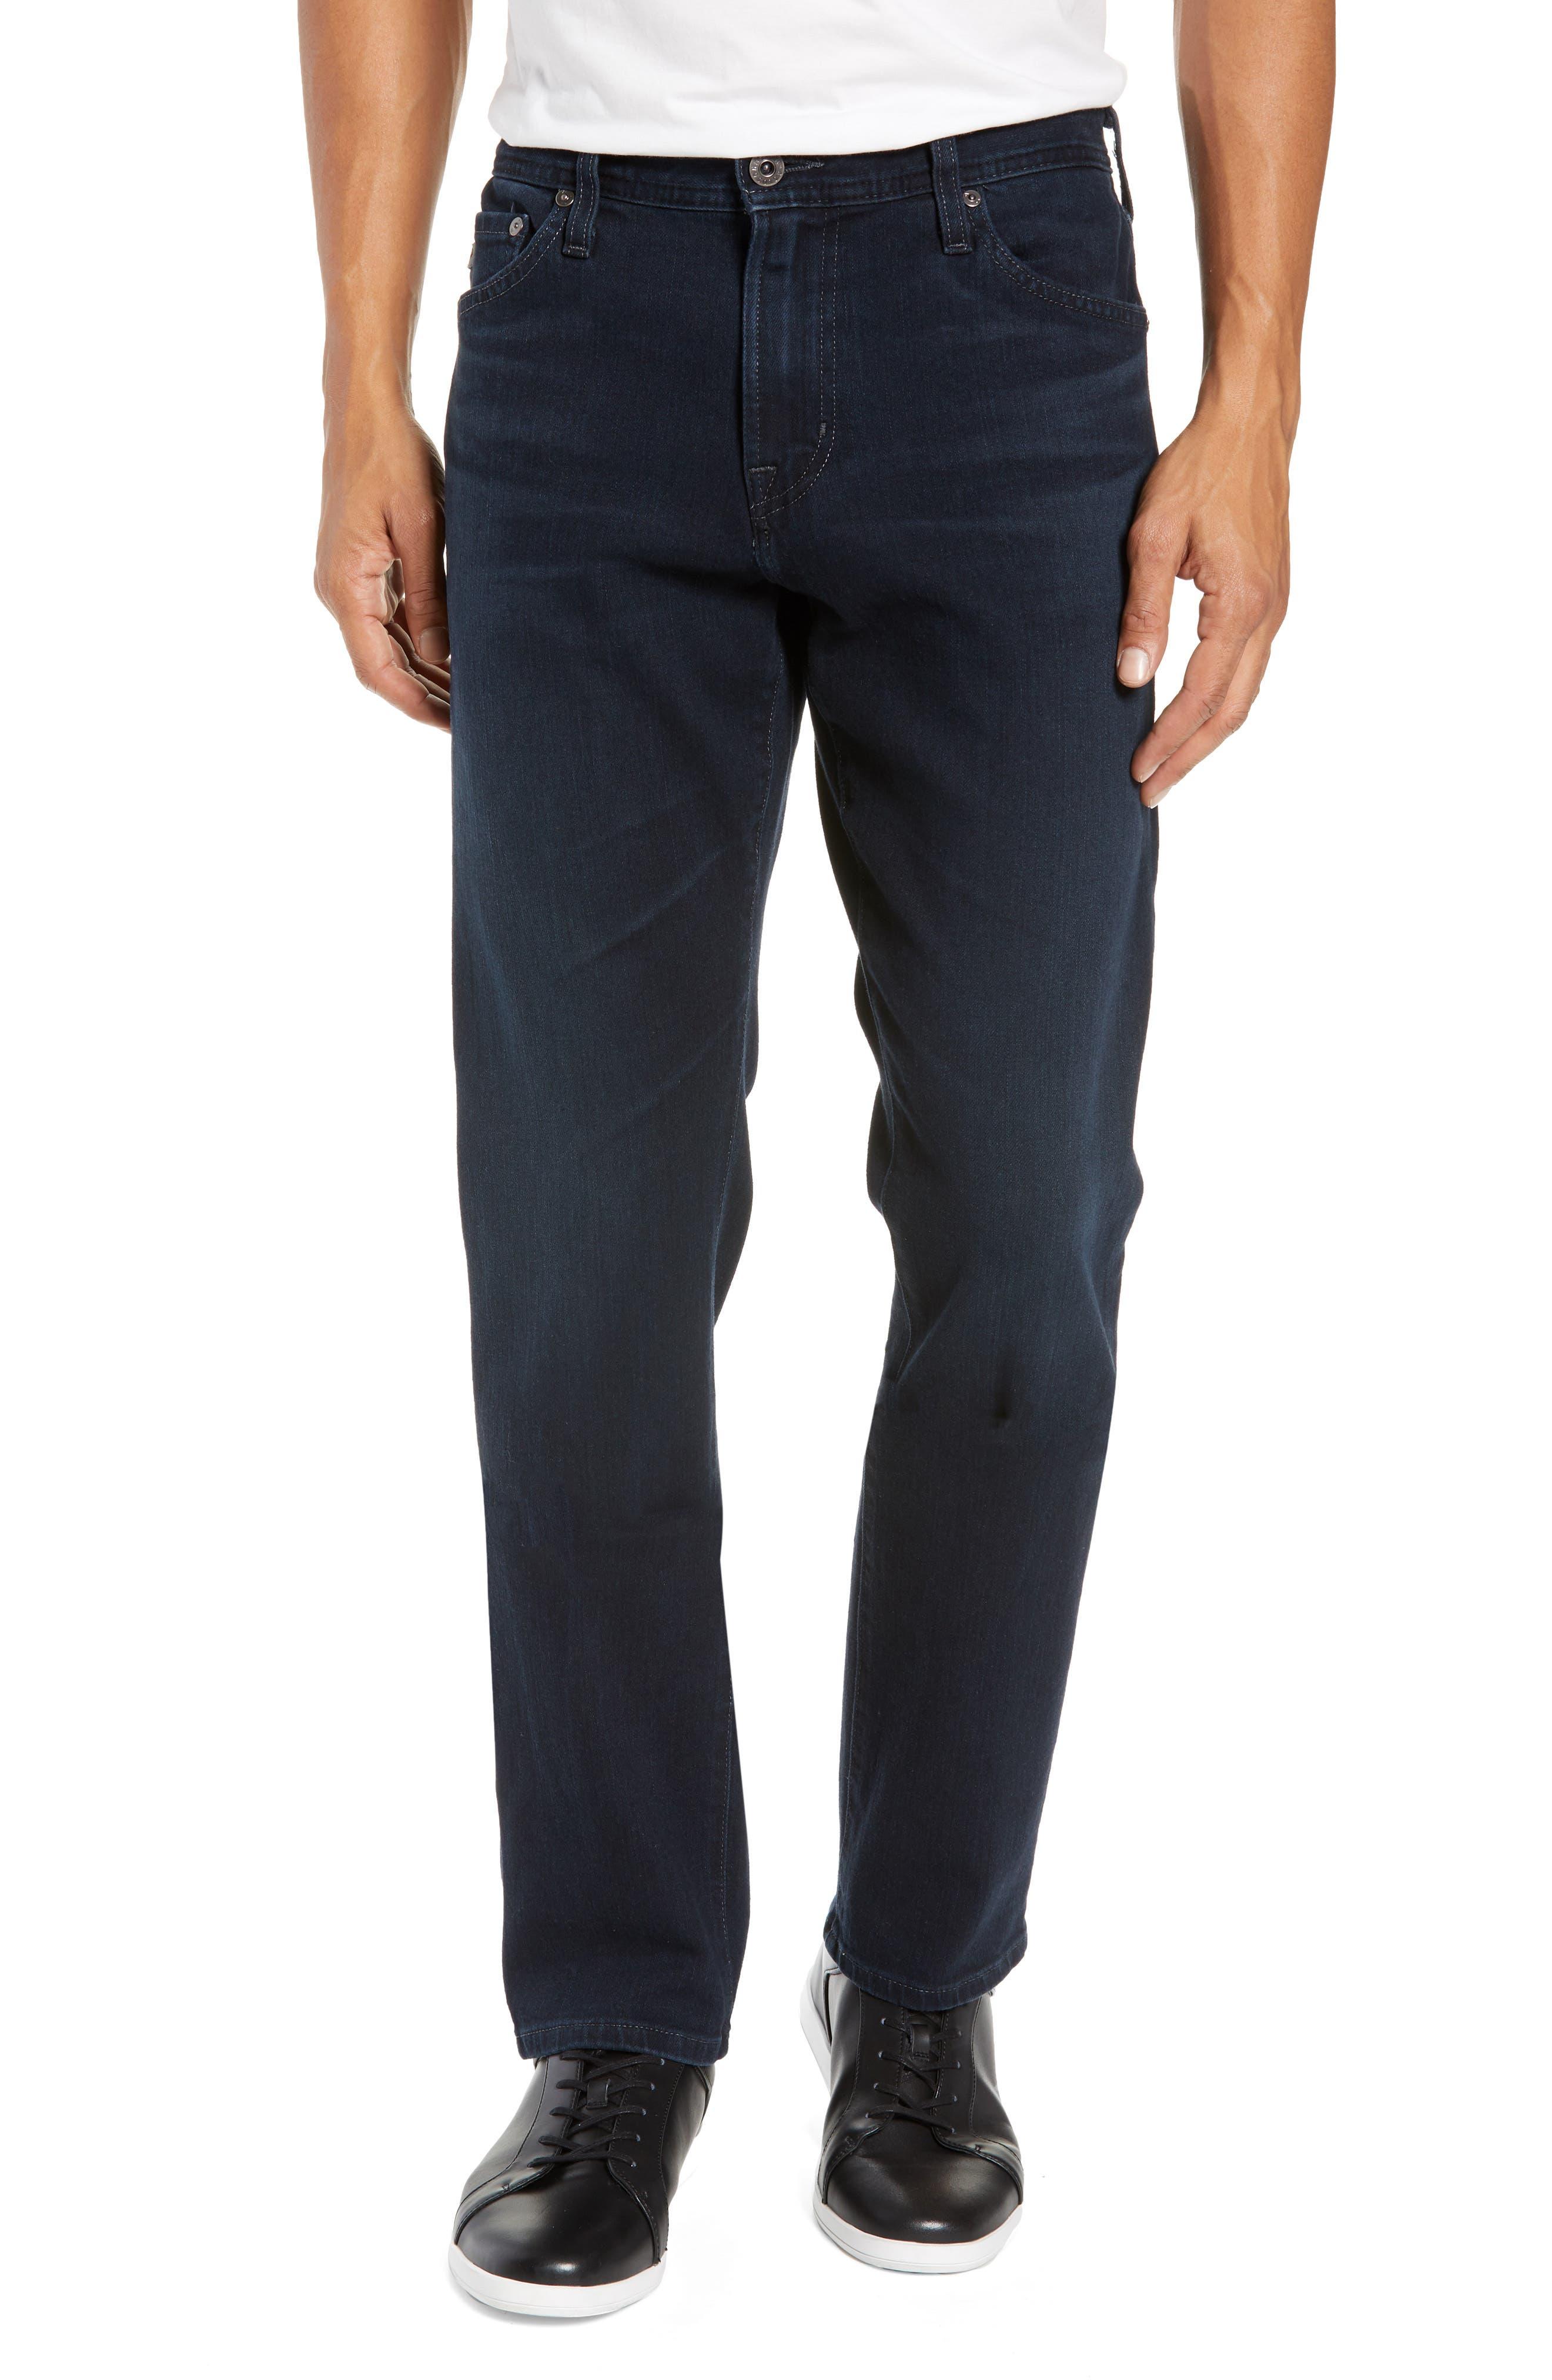 Everett Slim Straight Jeans,                             Main thumbnail 1, color,                             ORISON